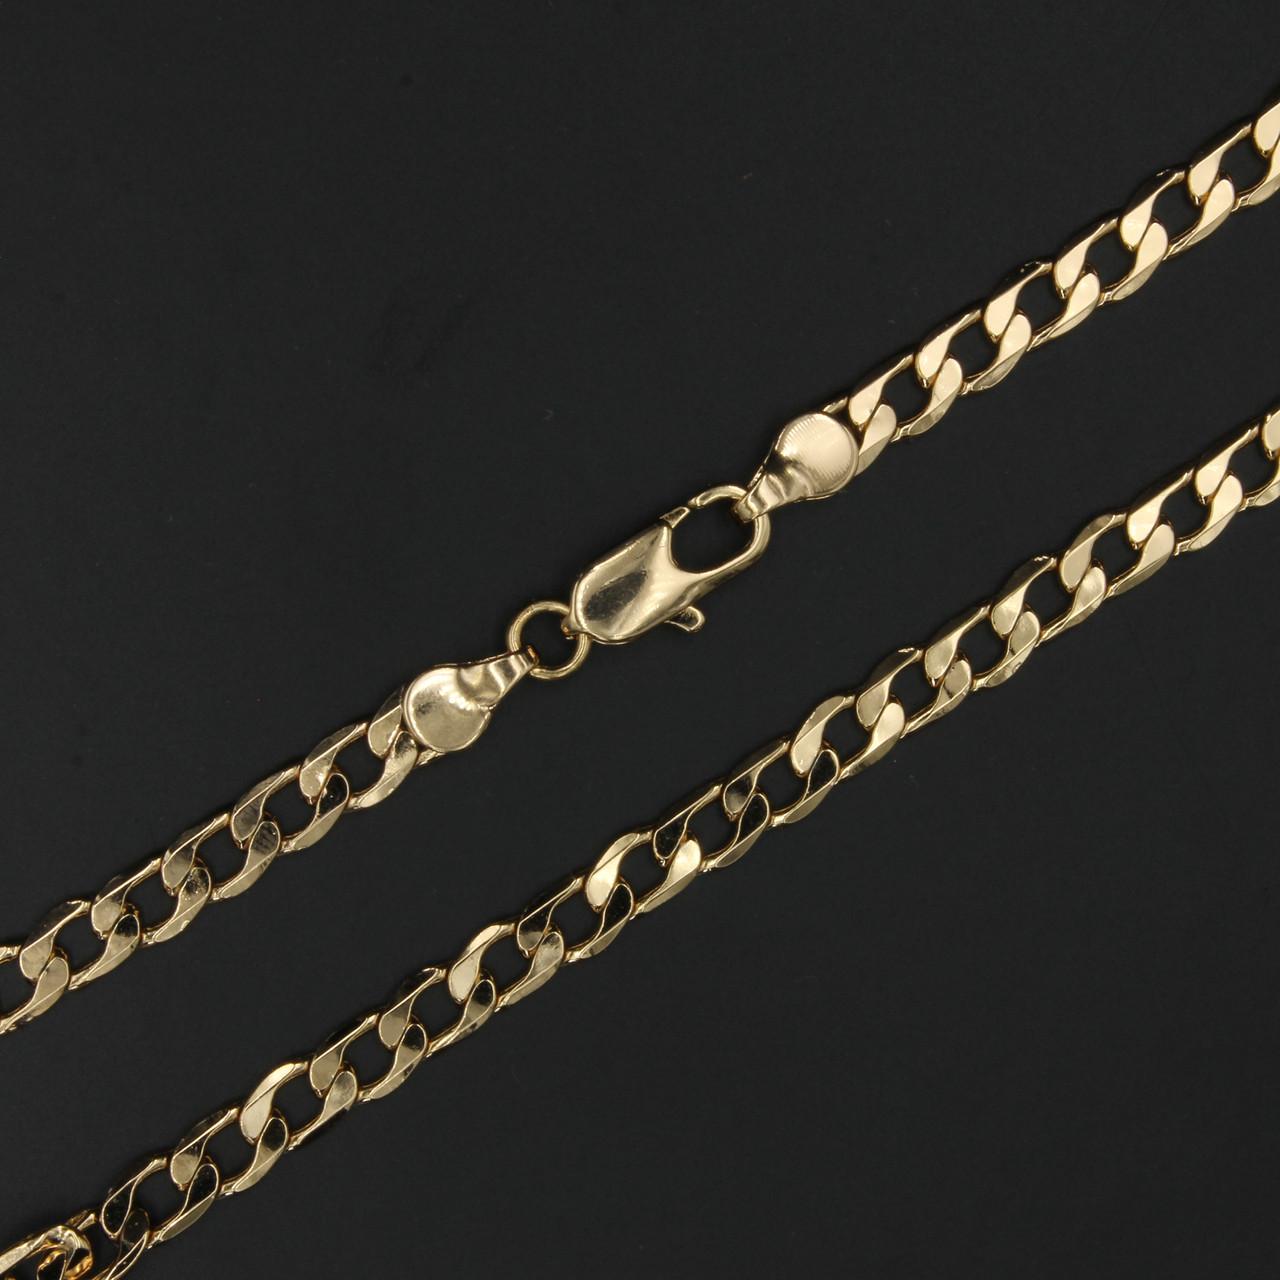 Цепочка Xuping Порто, плетение панцирное, 50см